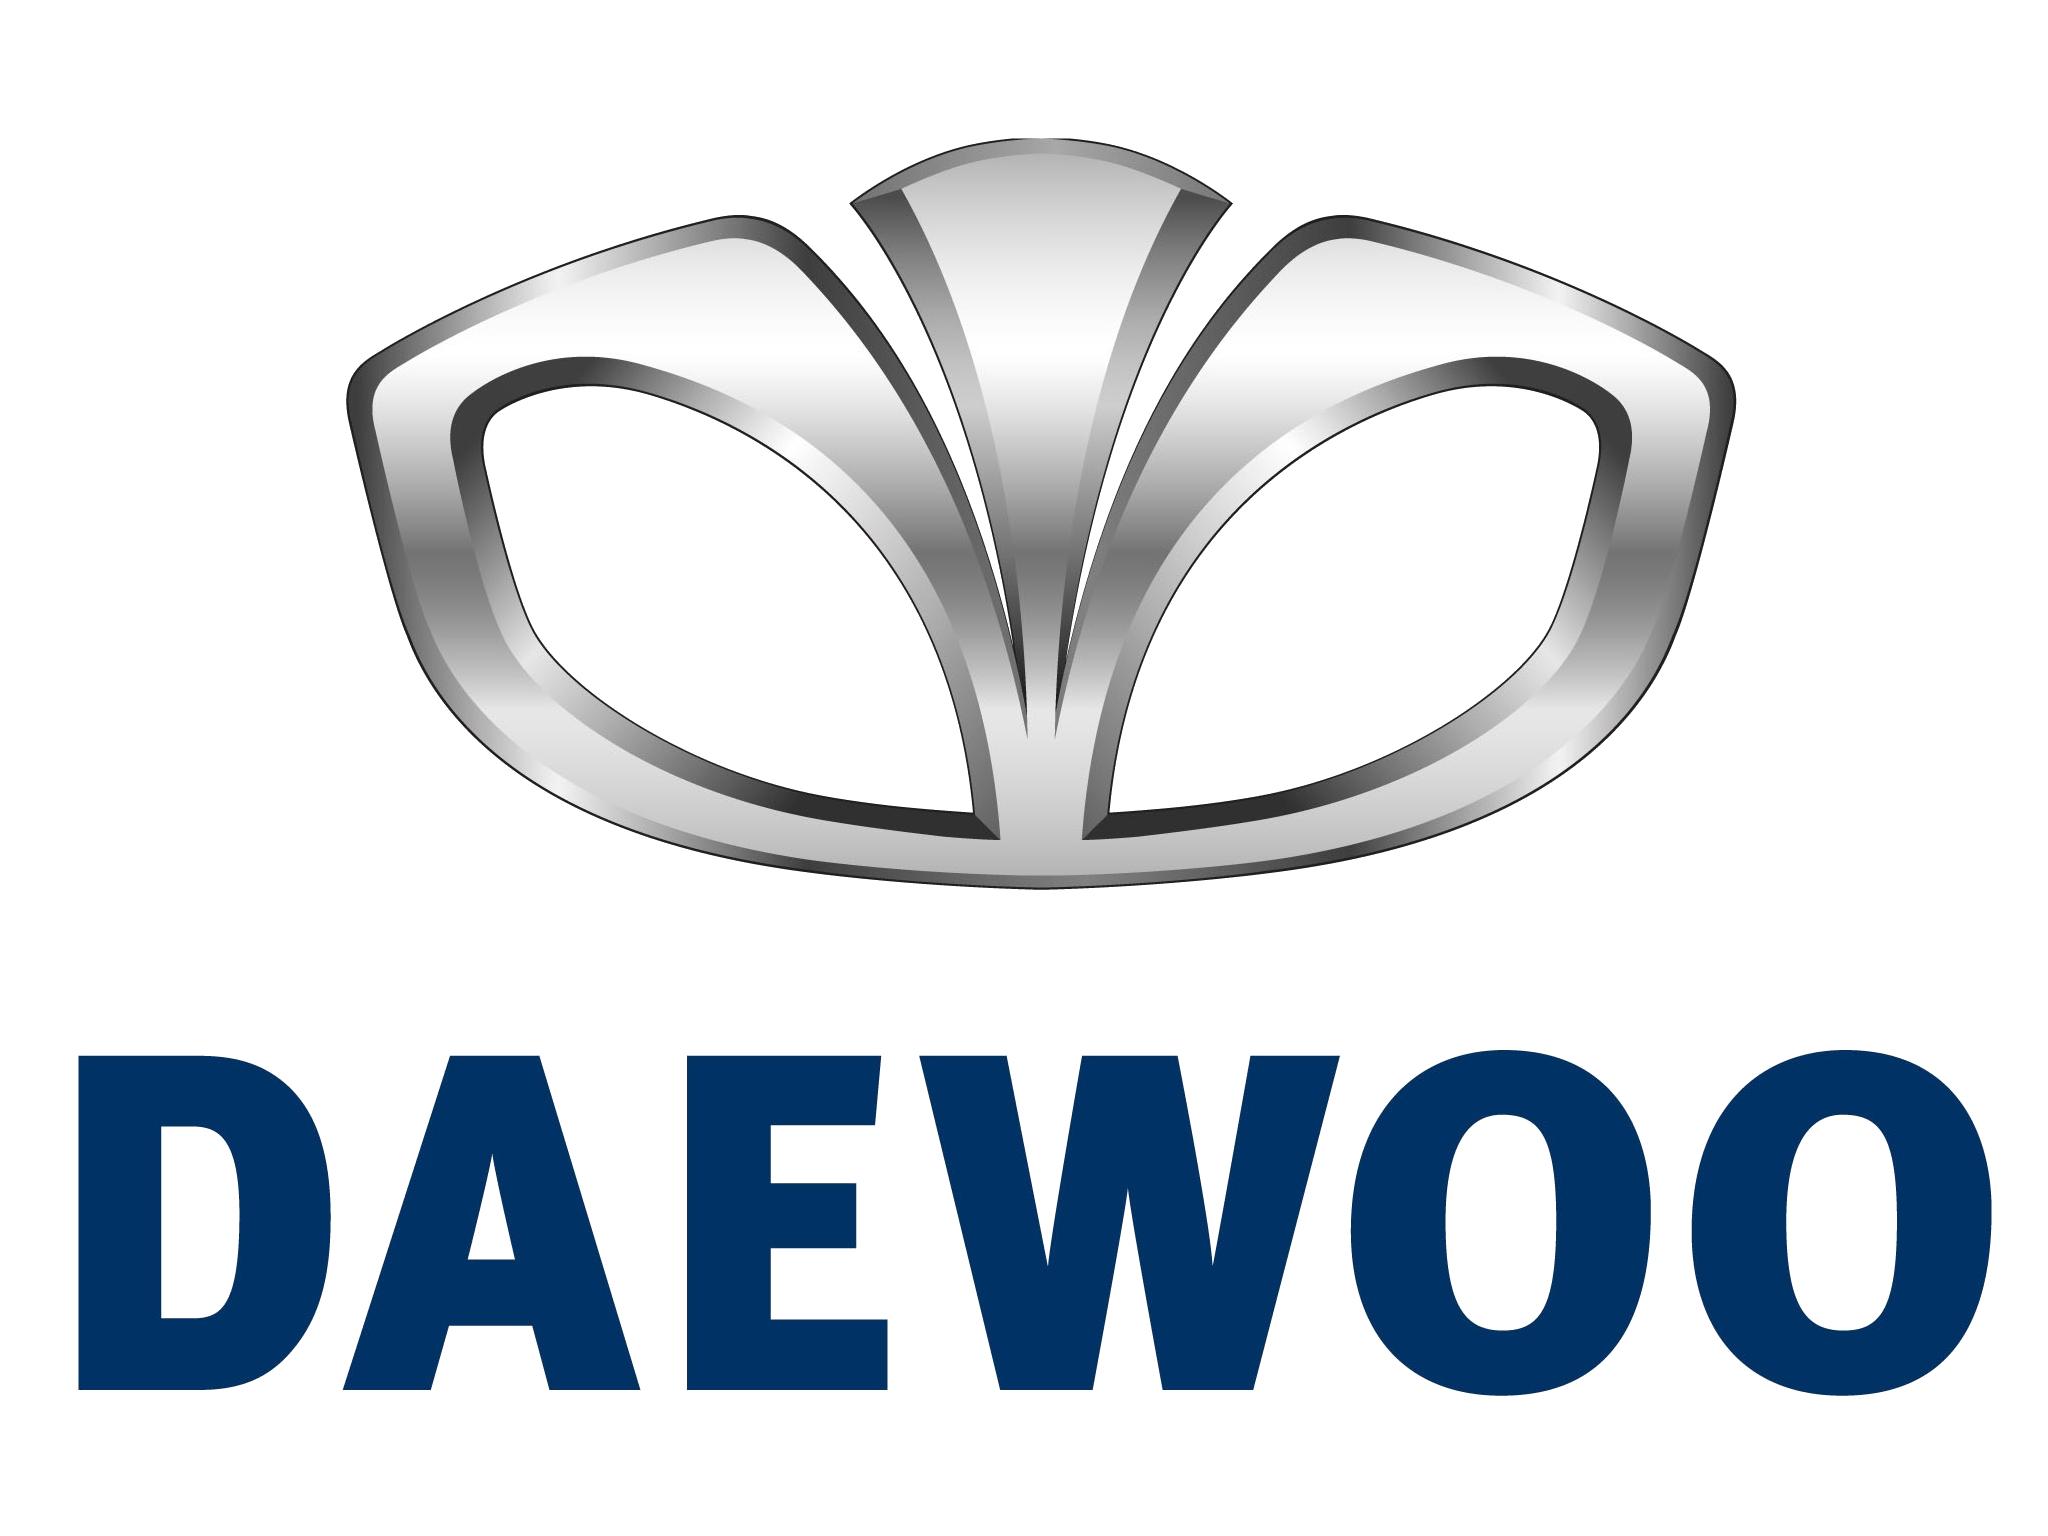 Daewoo логотип PNG